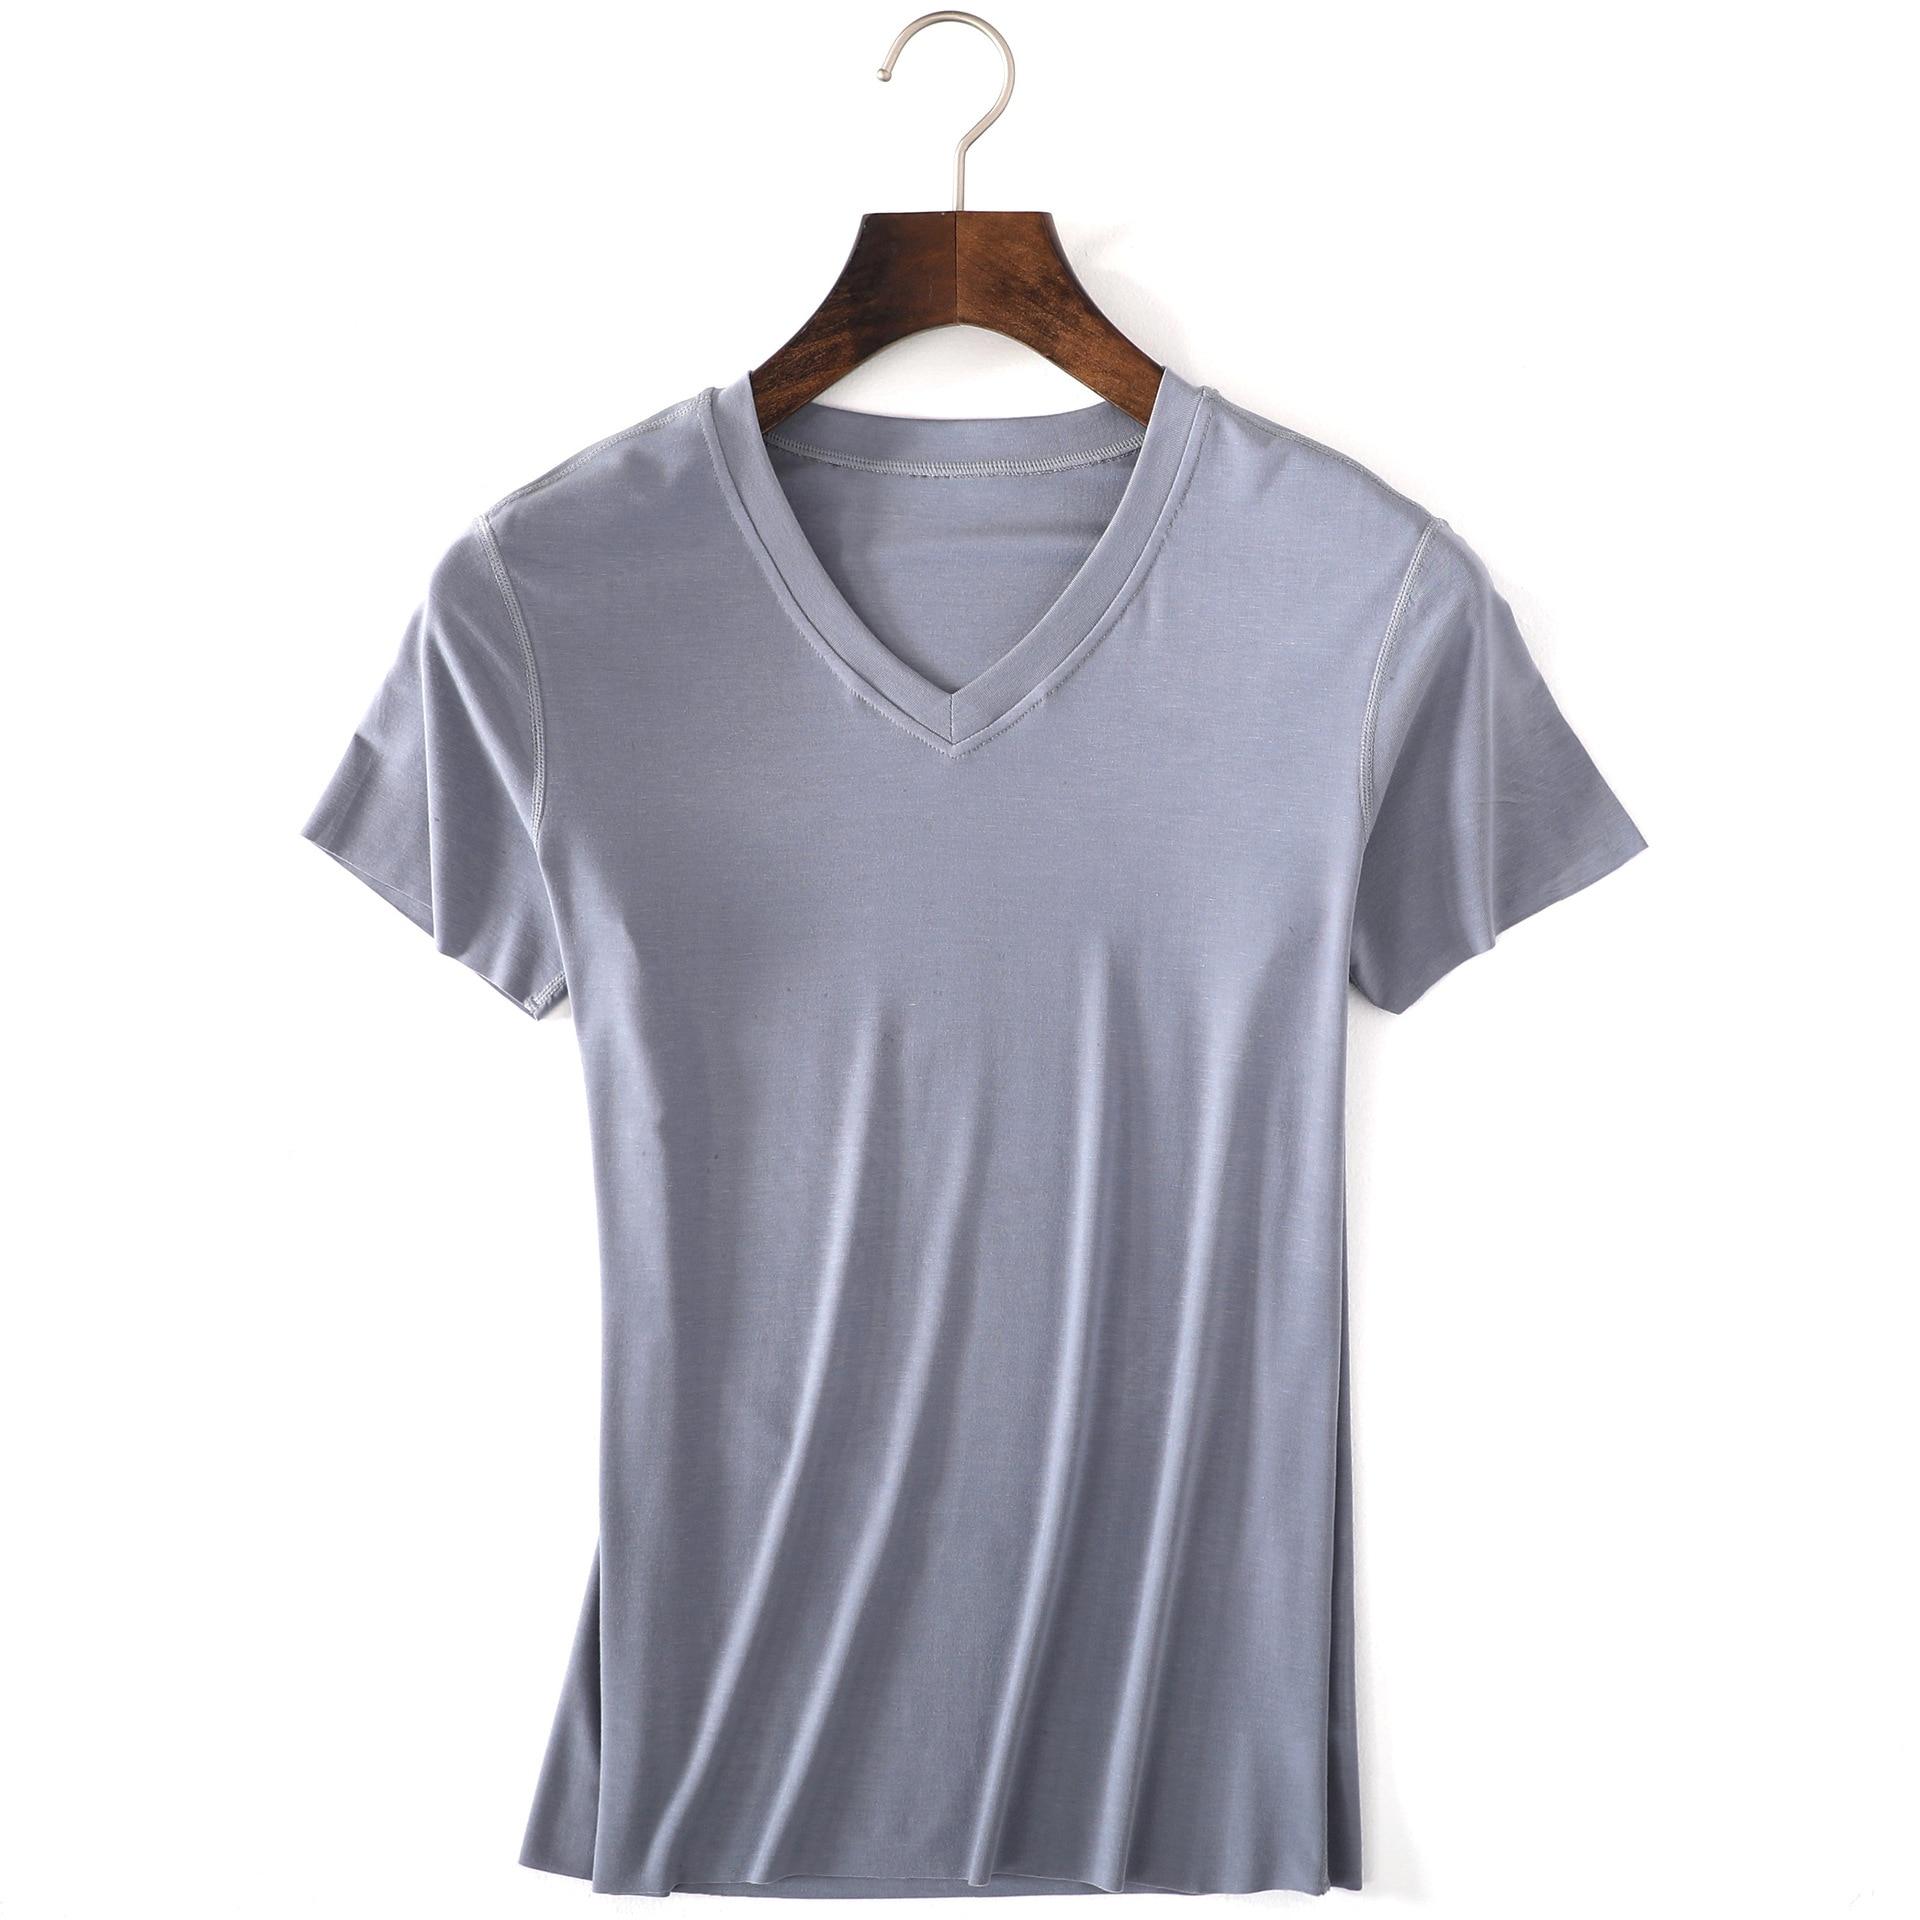 Summer Modal Close-fitting Mens Tank Tops Sleepshirt Traceless Sleep Tops Sexy V-neck Mens Bottoming Shirt Homewear Nightshirt